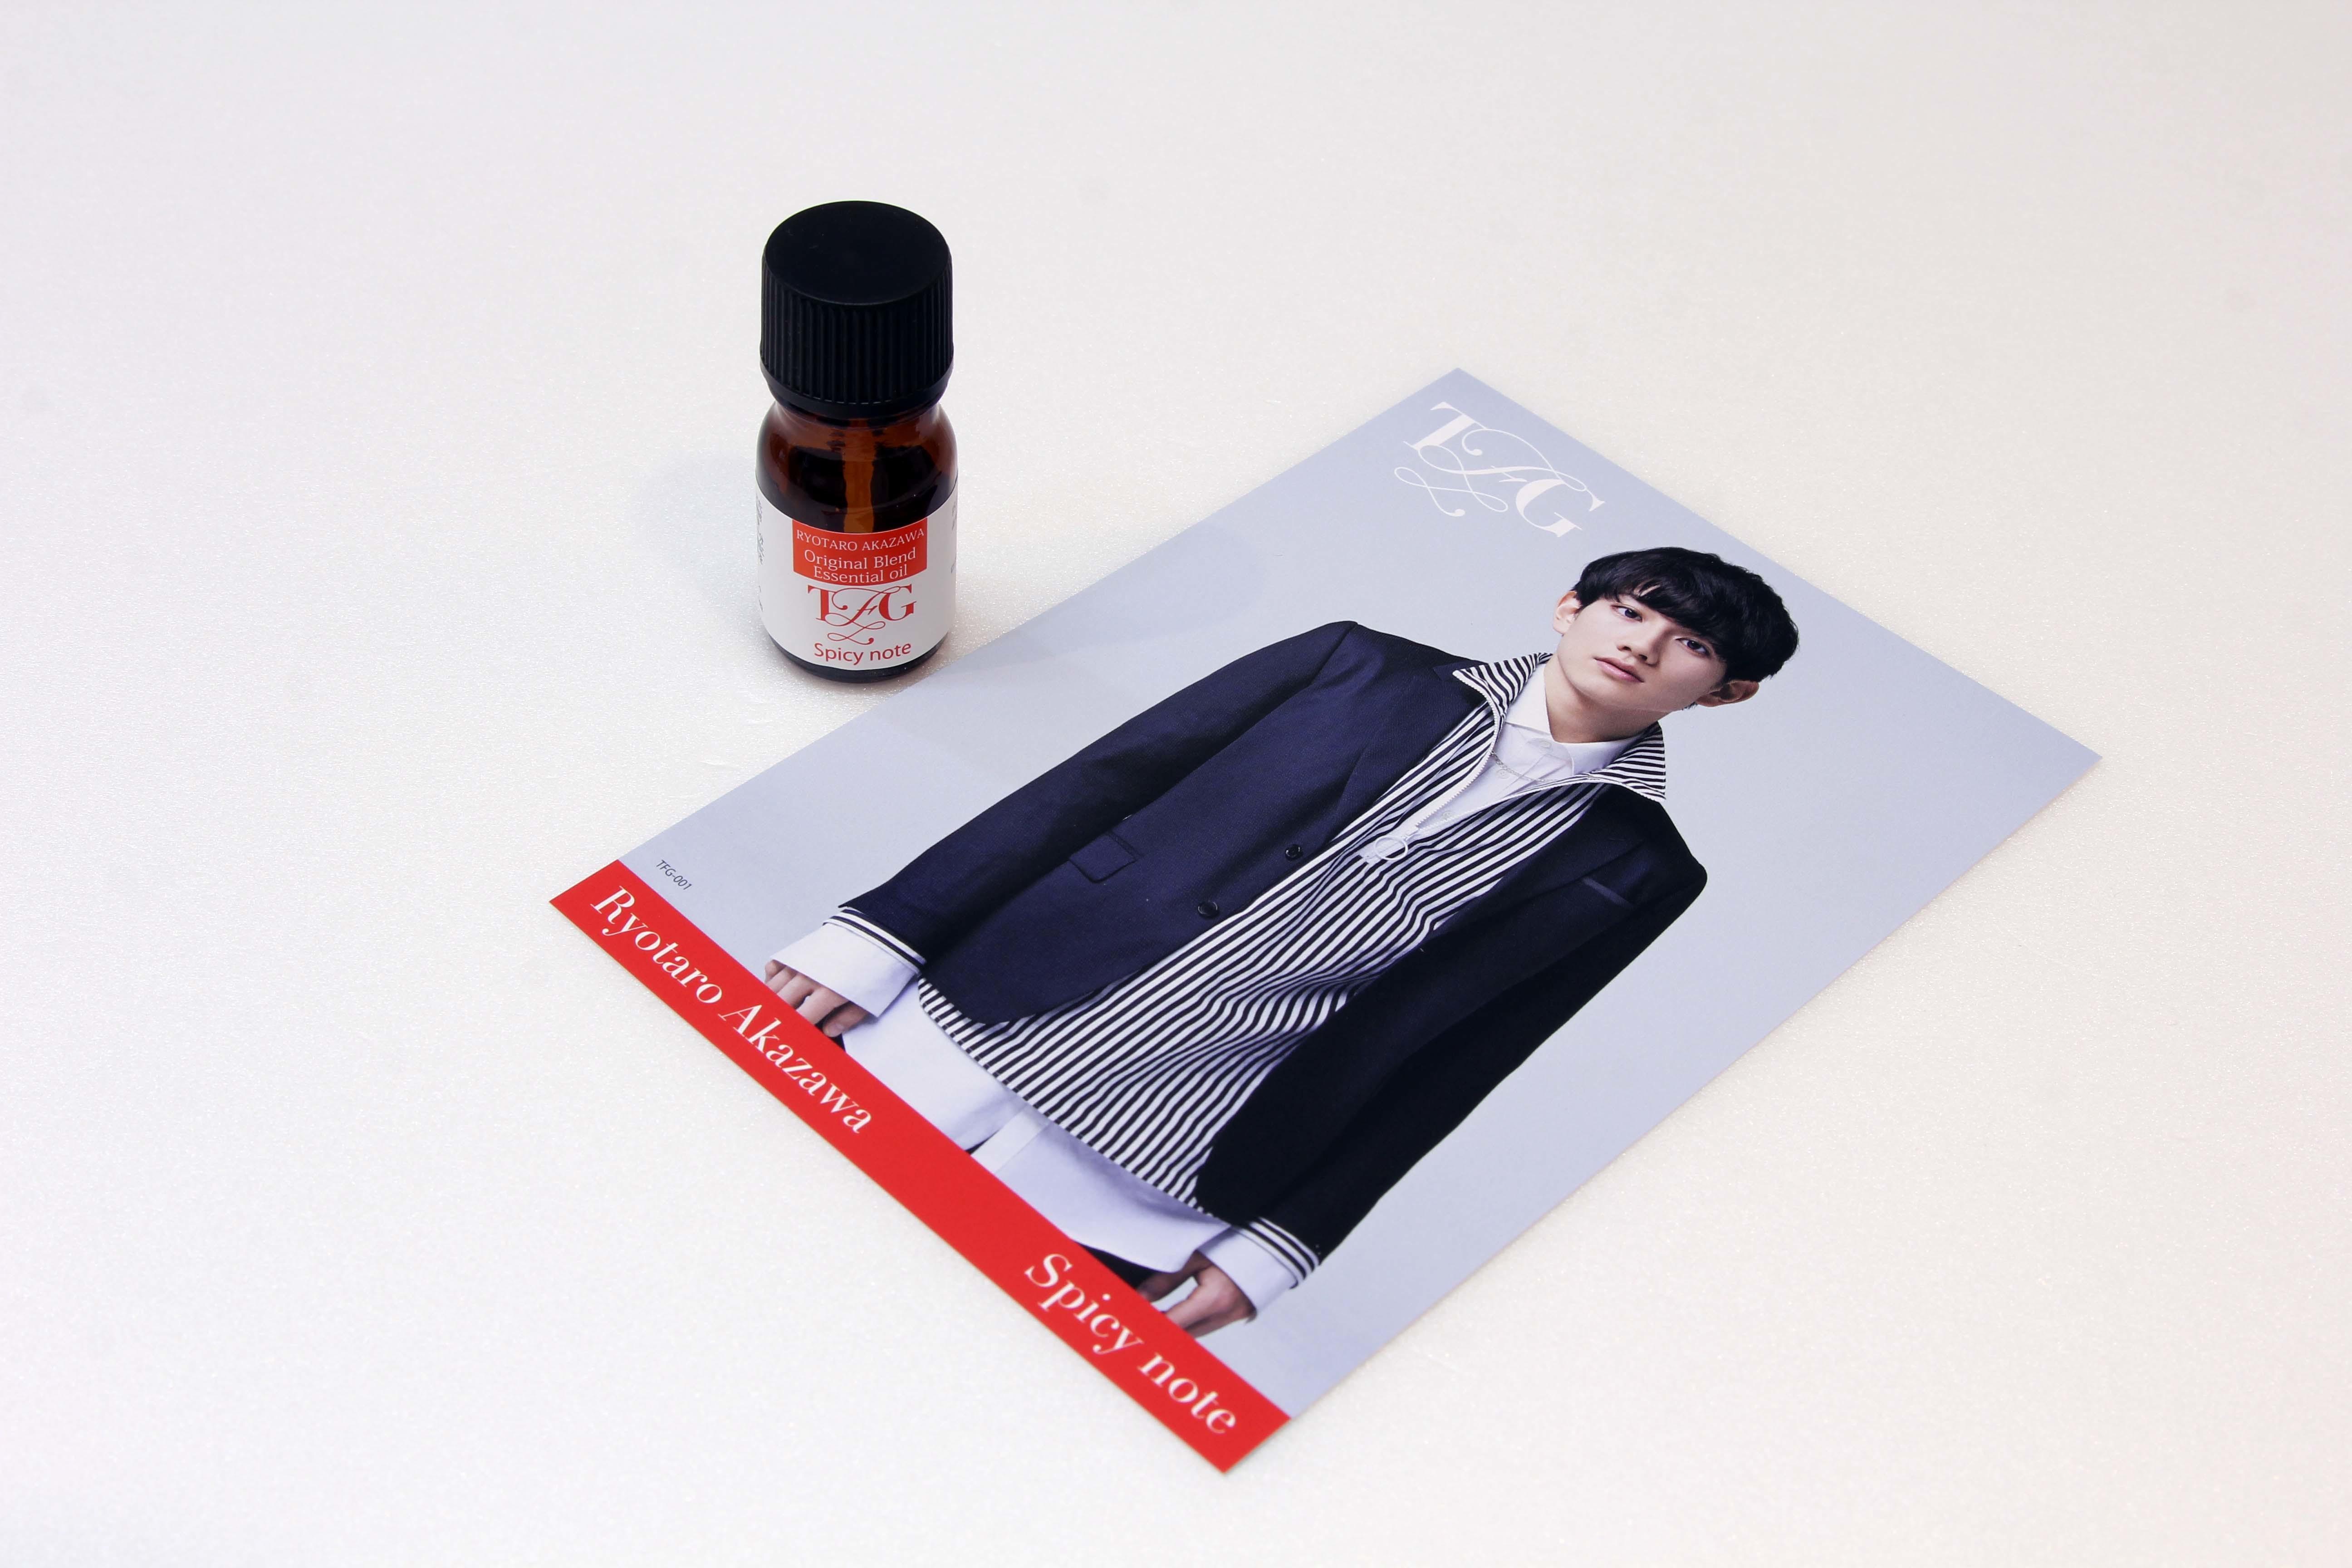 ①Ryotaro Akazawa<Spicy note>オリジナルブレンドエッセンシャルオイル